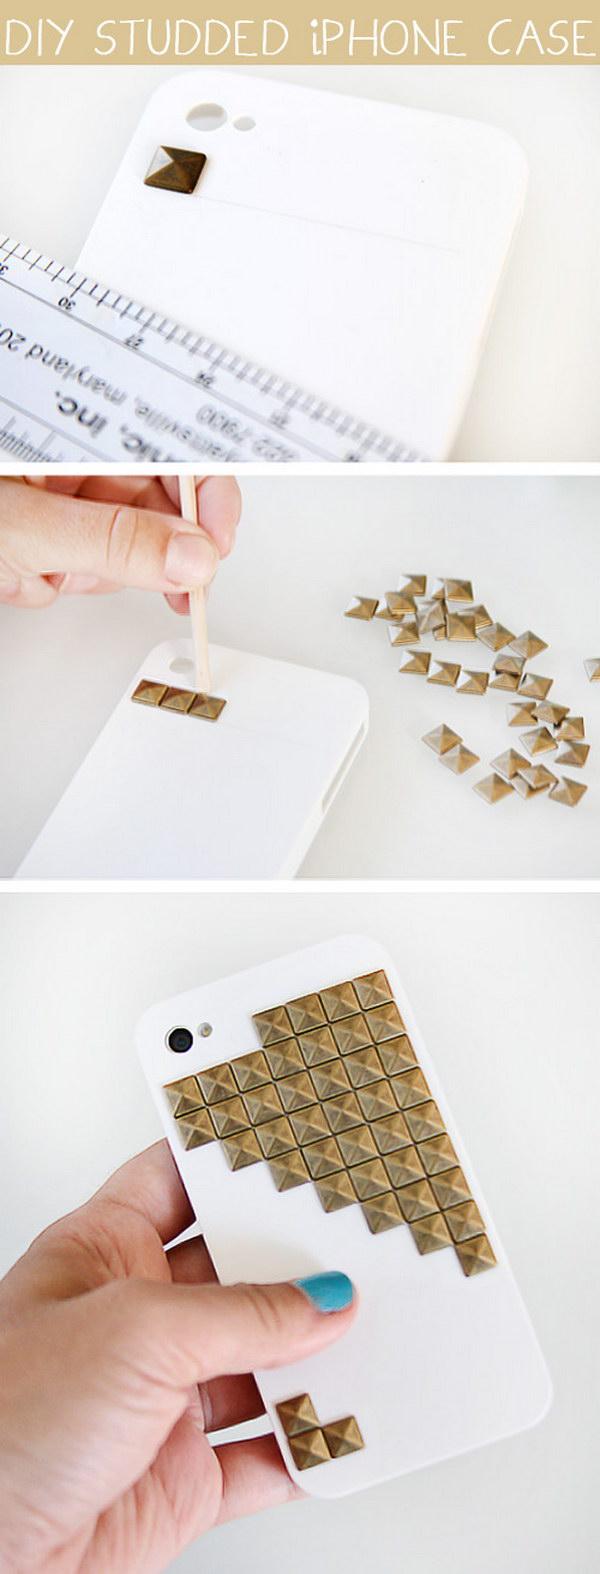 DIY Studded iPhone Case.